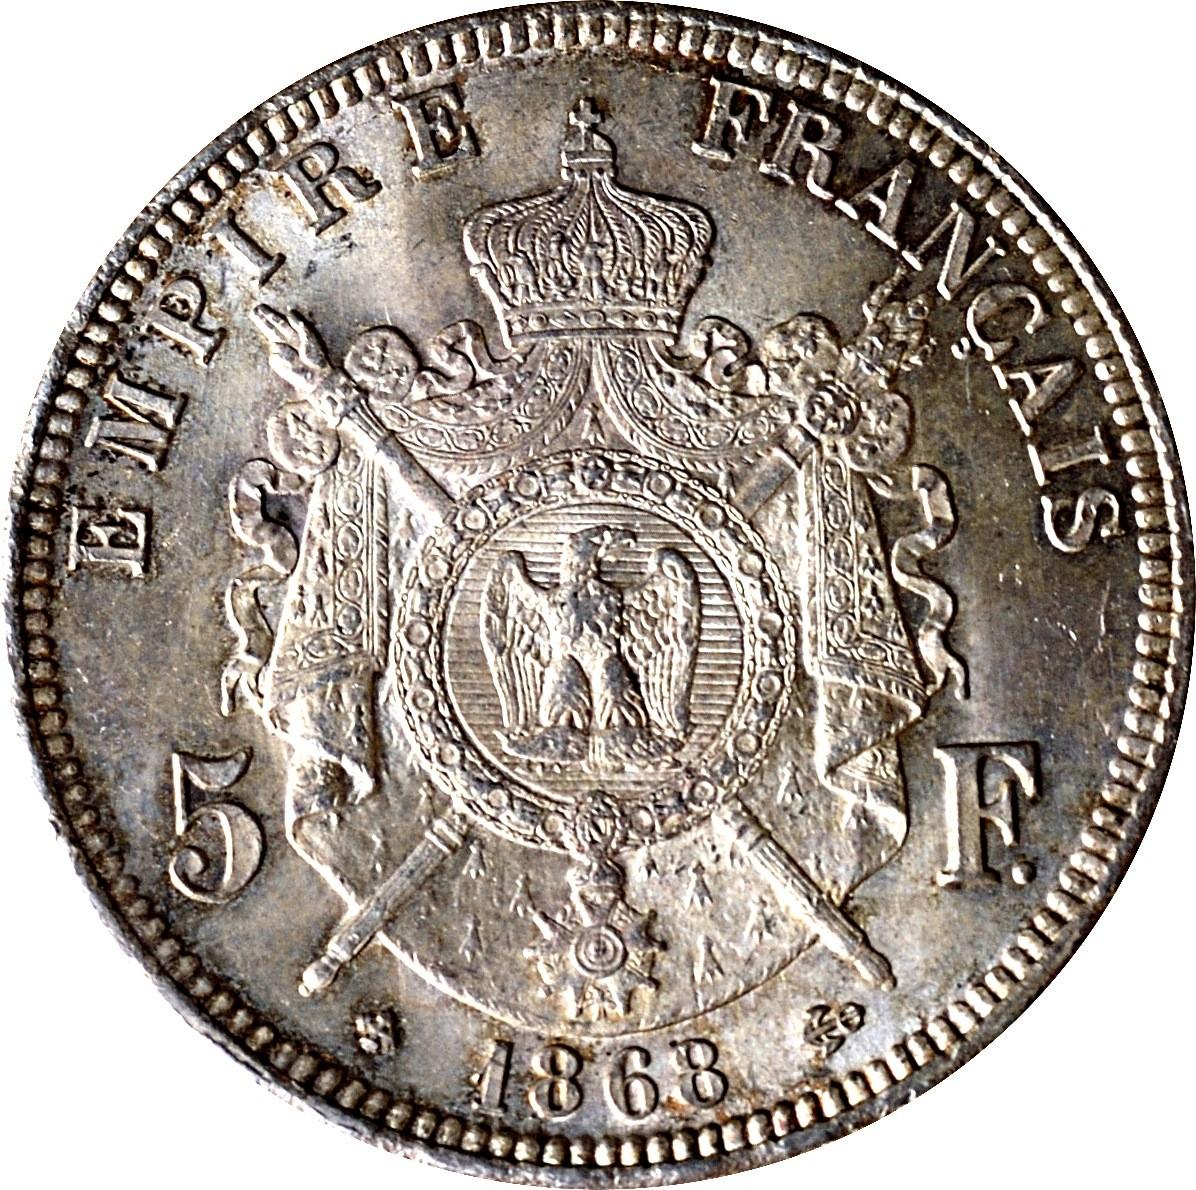 France 5 Francs (1861-1870 Napoleon III)